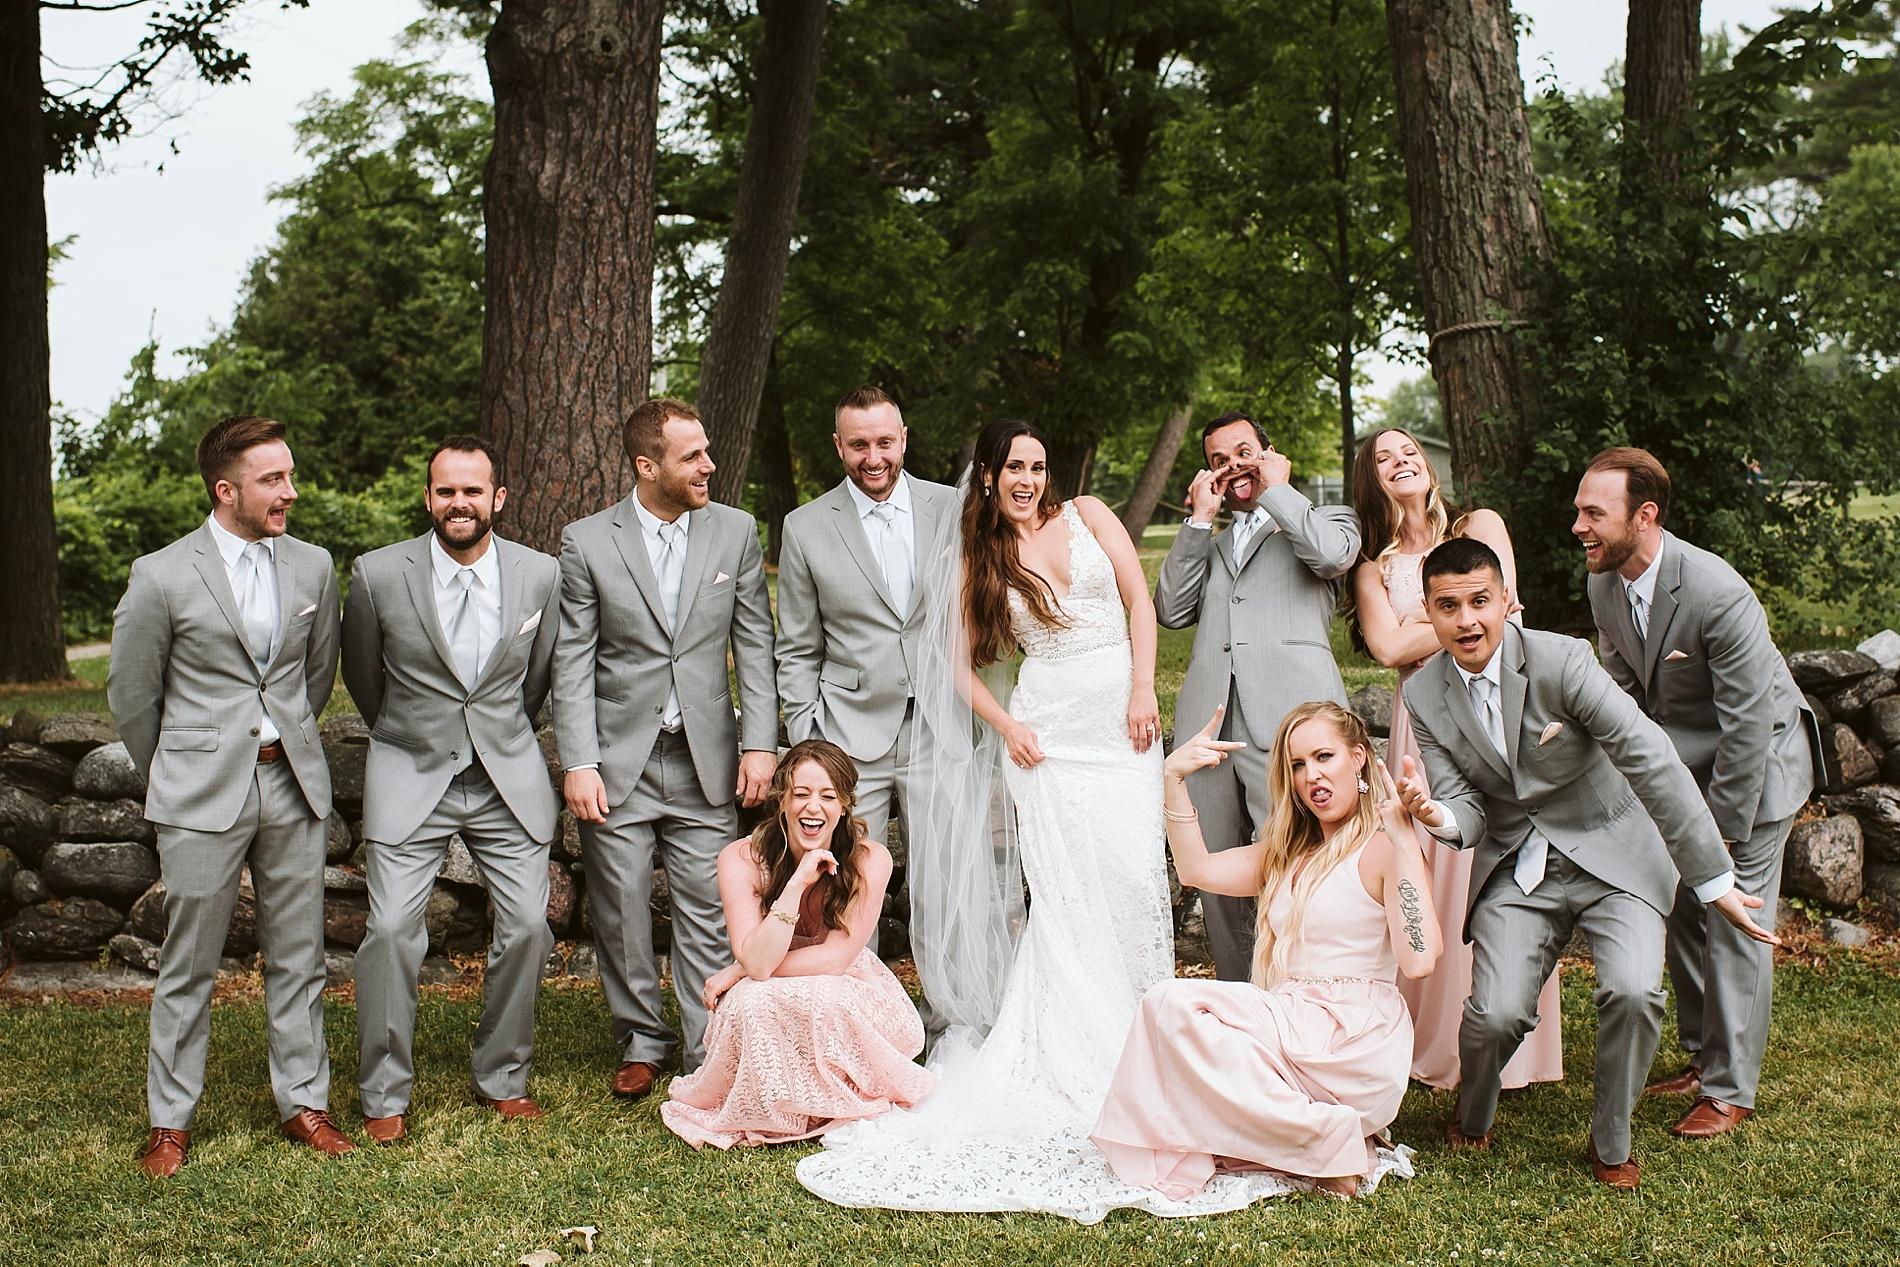 Kawartha_Lakes_Wedding_Bobcageon_Eganridge_Resort_Toronto_Photographer_0044.jpg